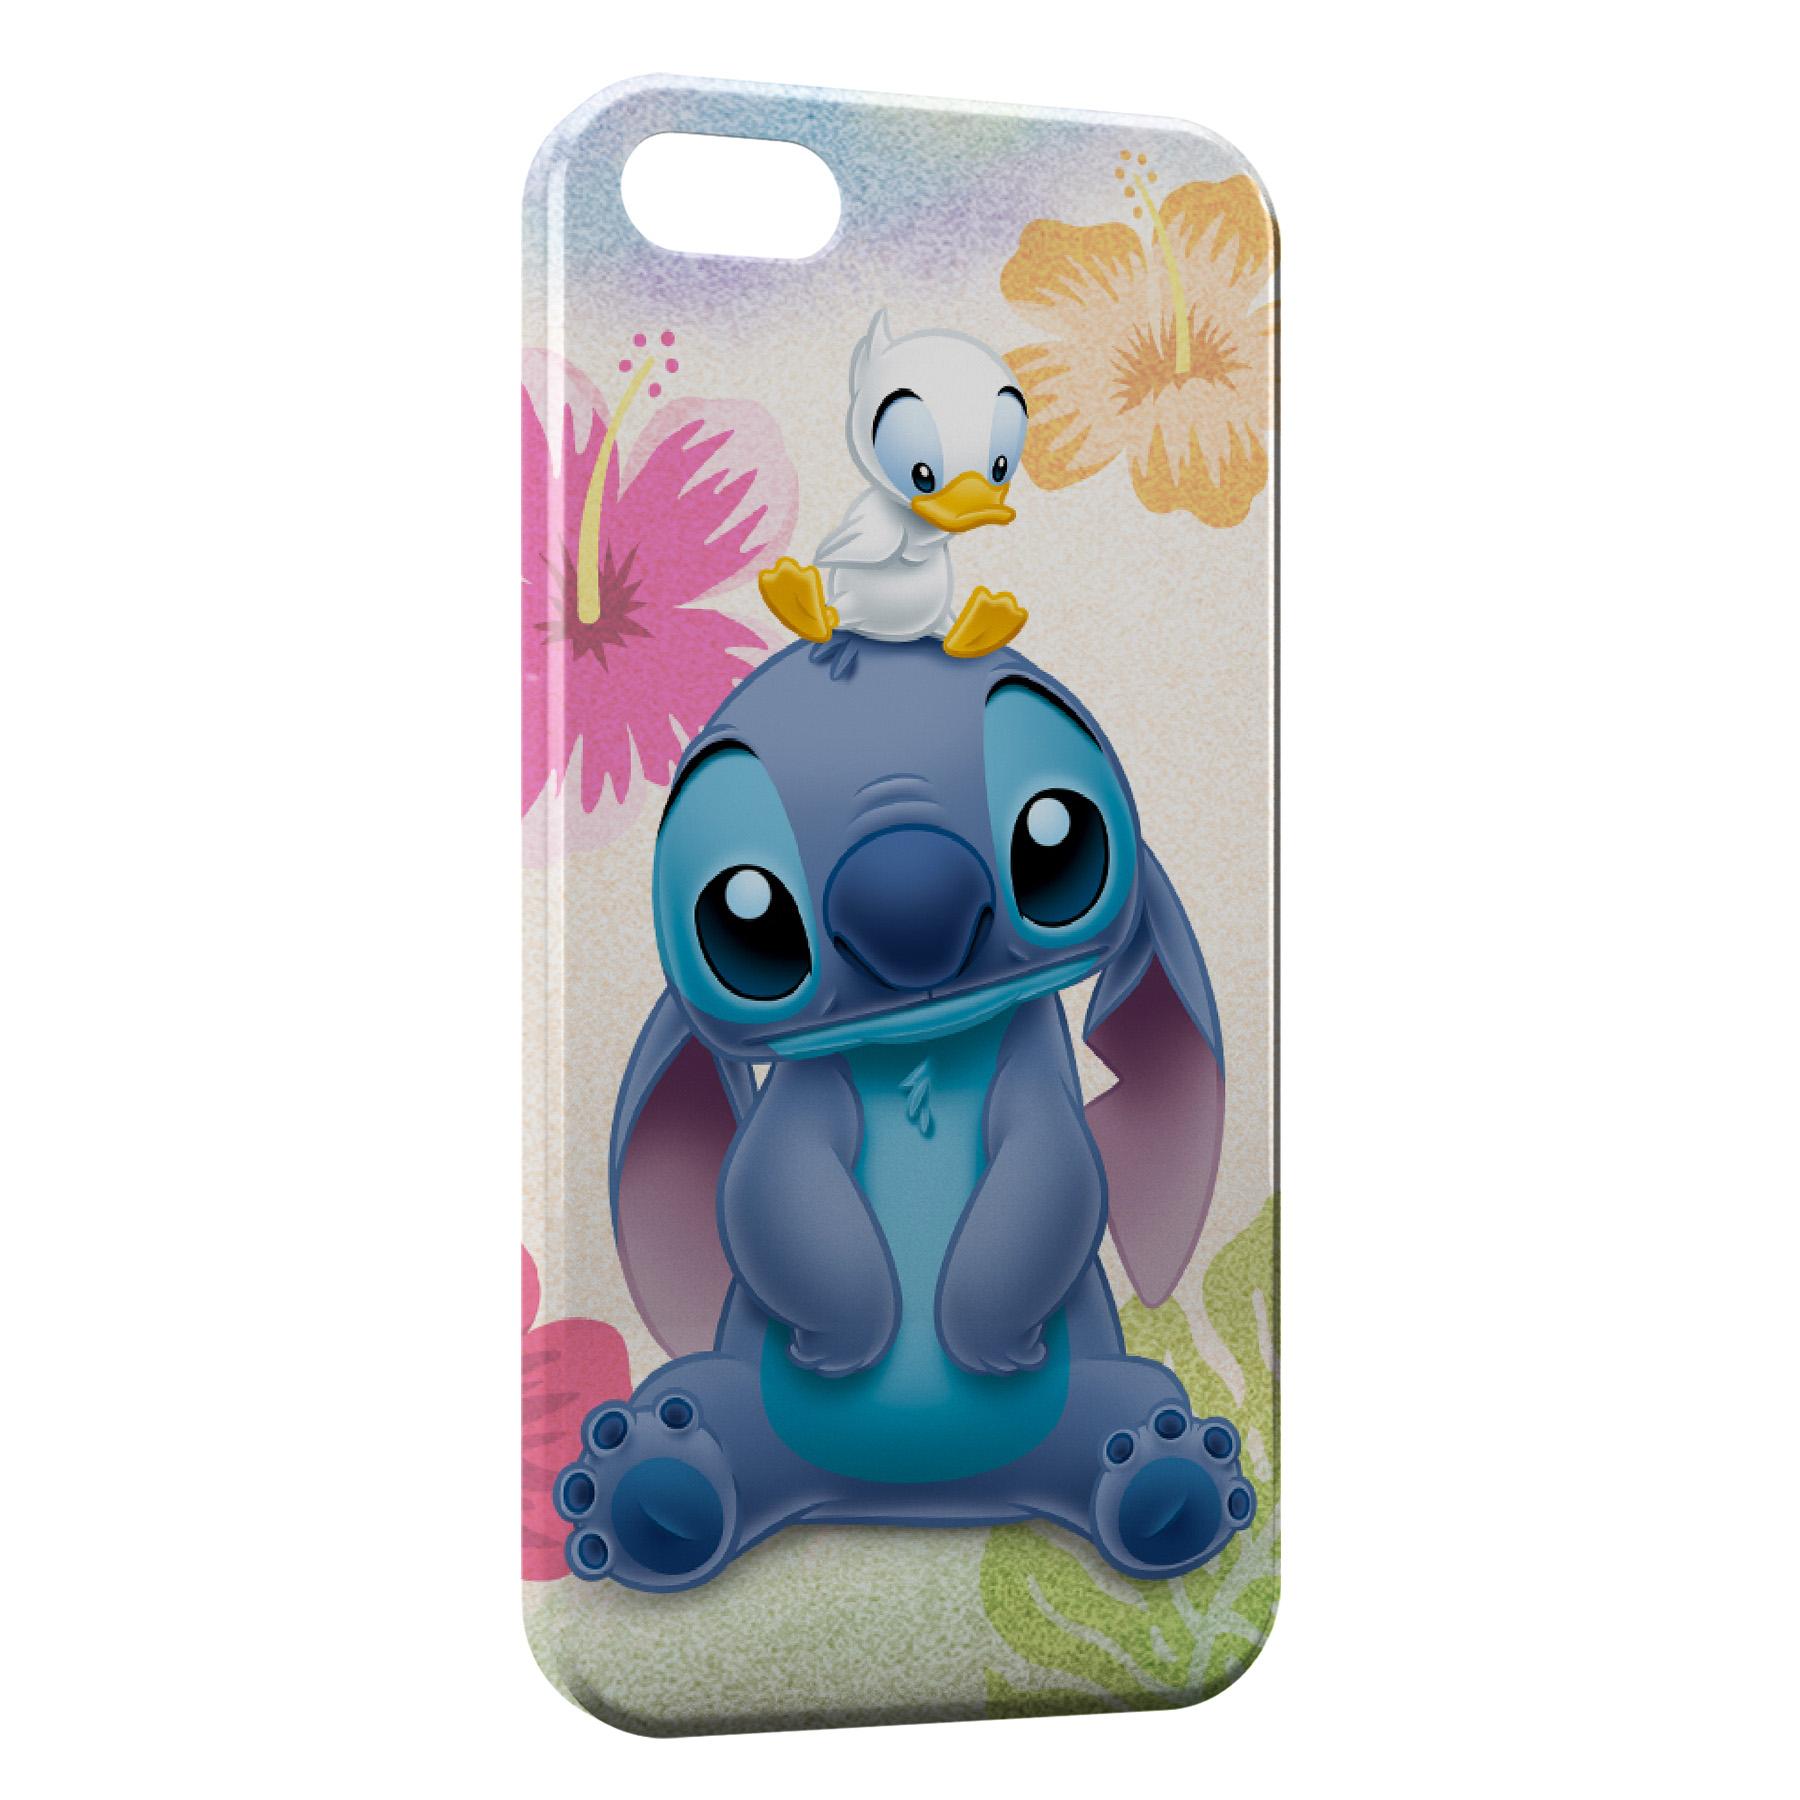 Coque iPhone 5/5S/SE Stitch Canard